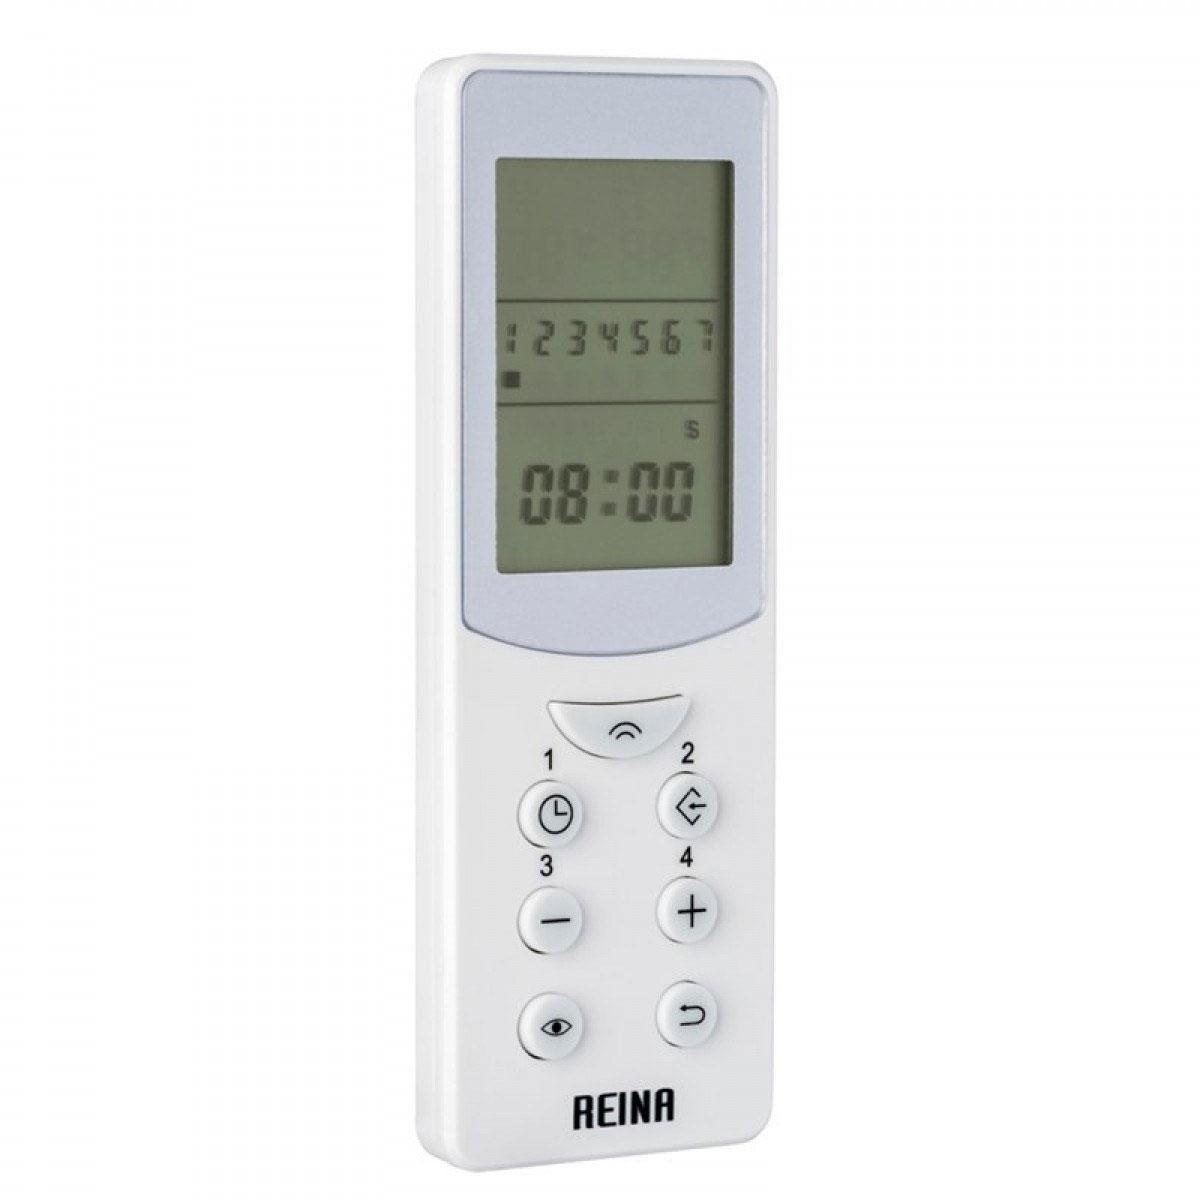 Reina Diva Thermostatic Electric Straight Heated Towel Rail 800mm H x 300mm W Chrome-1